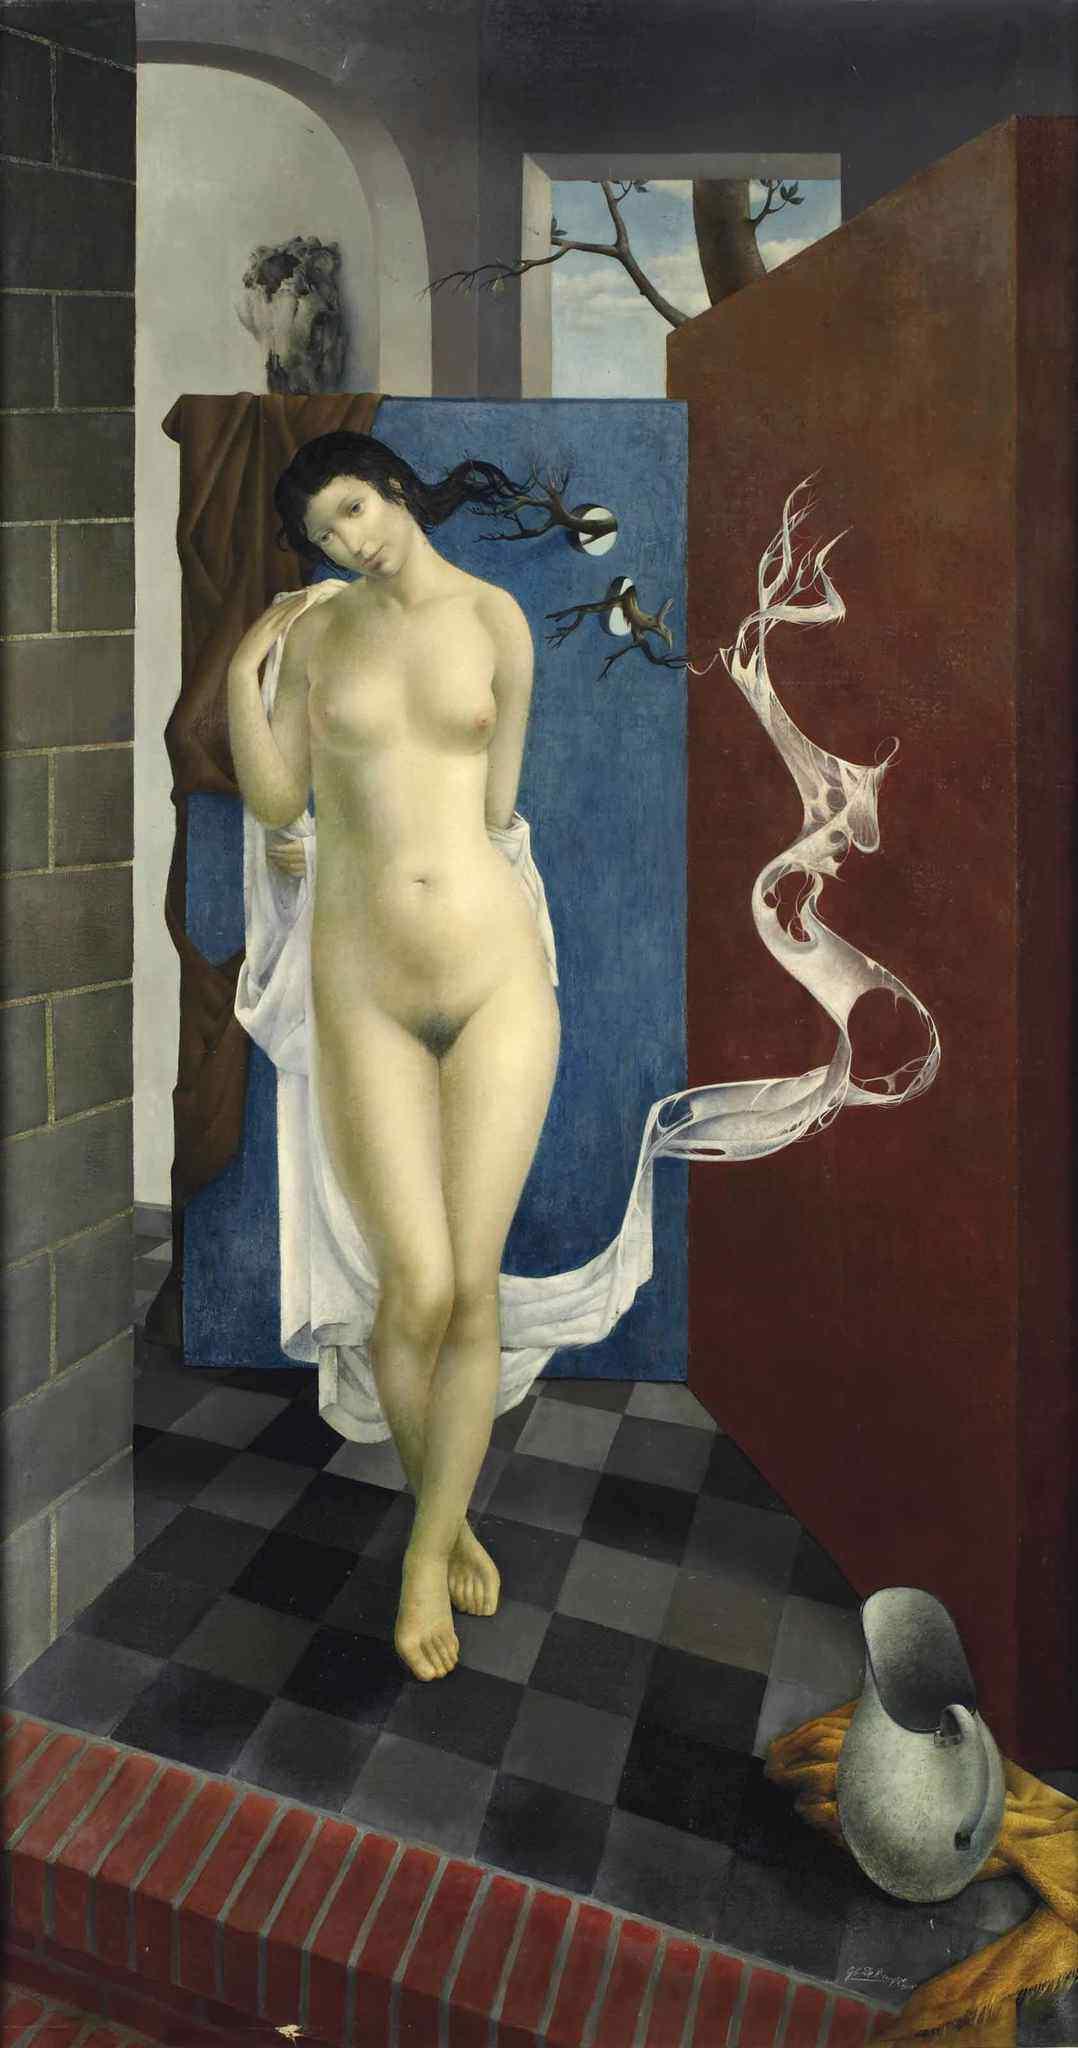 Gustaaf De Bruyne, 1914-1981. Стоящая обнаженная. 149 x 80 см. Частная коллекция